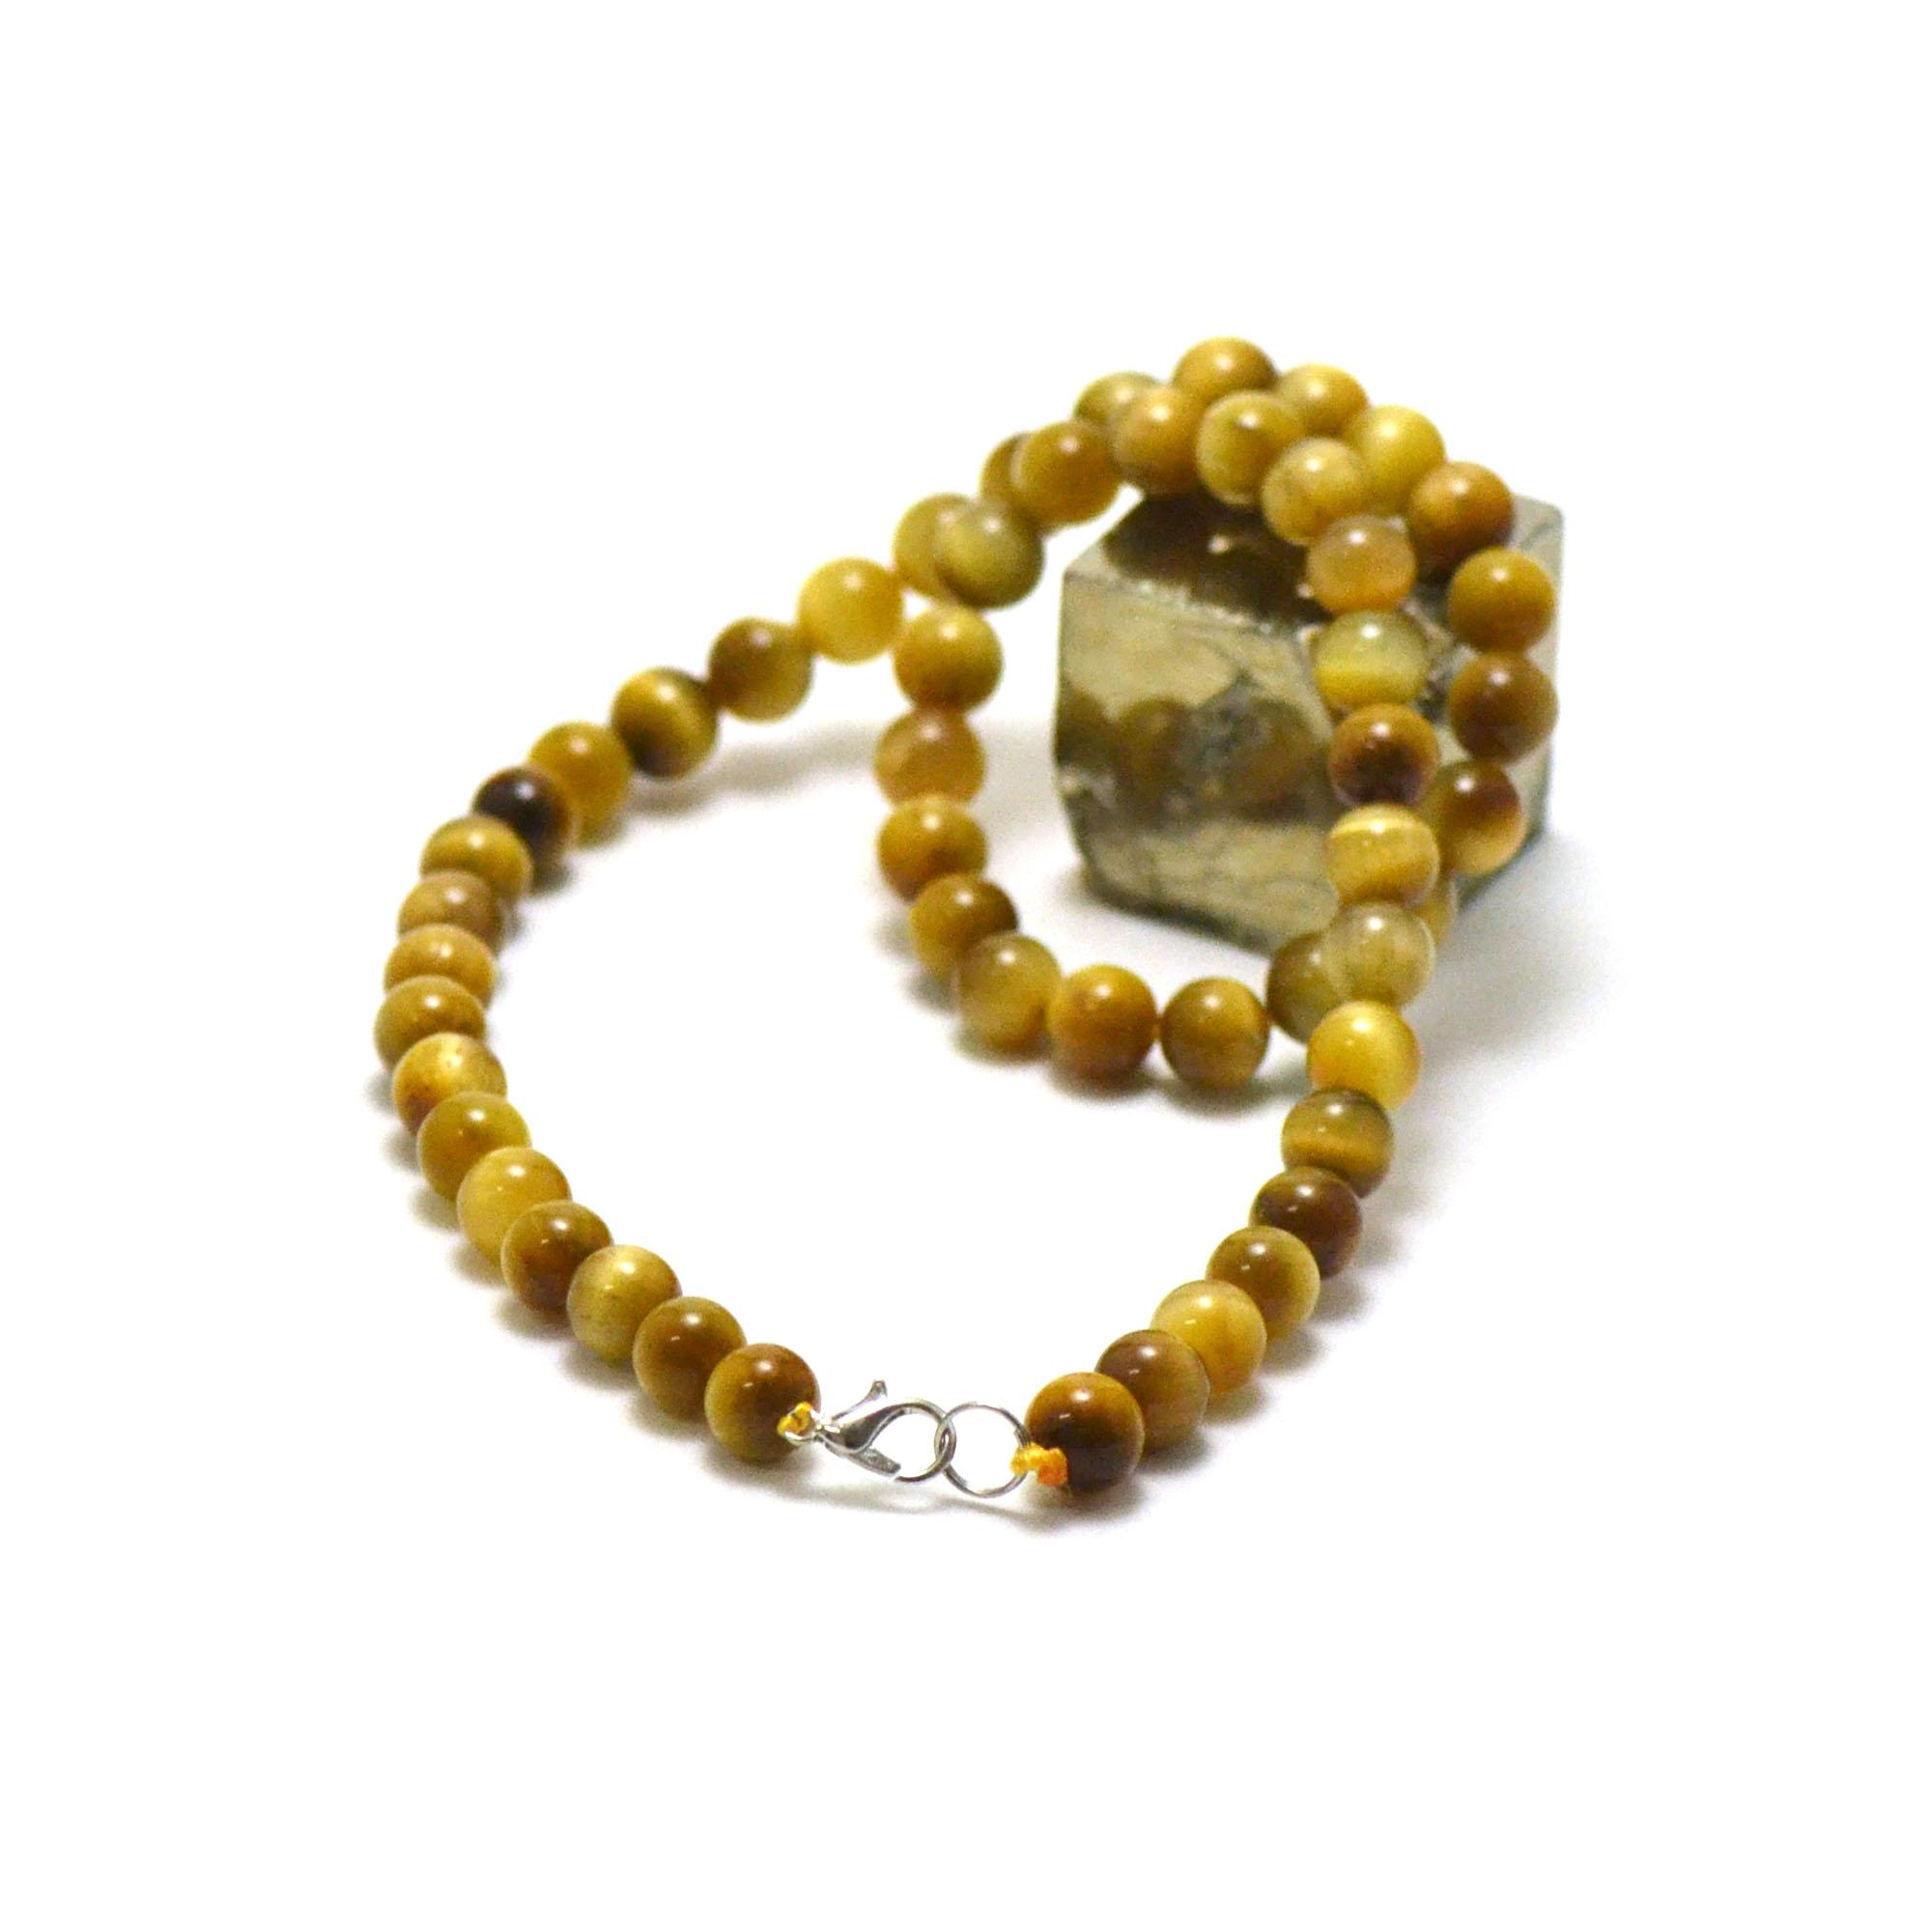 collier oeil de tigre doré, perle ronde 8 mm